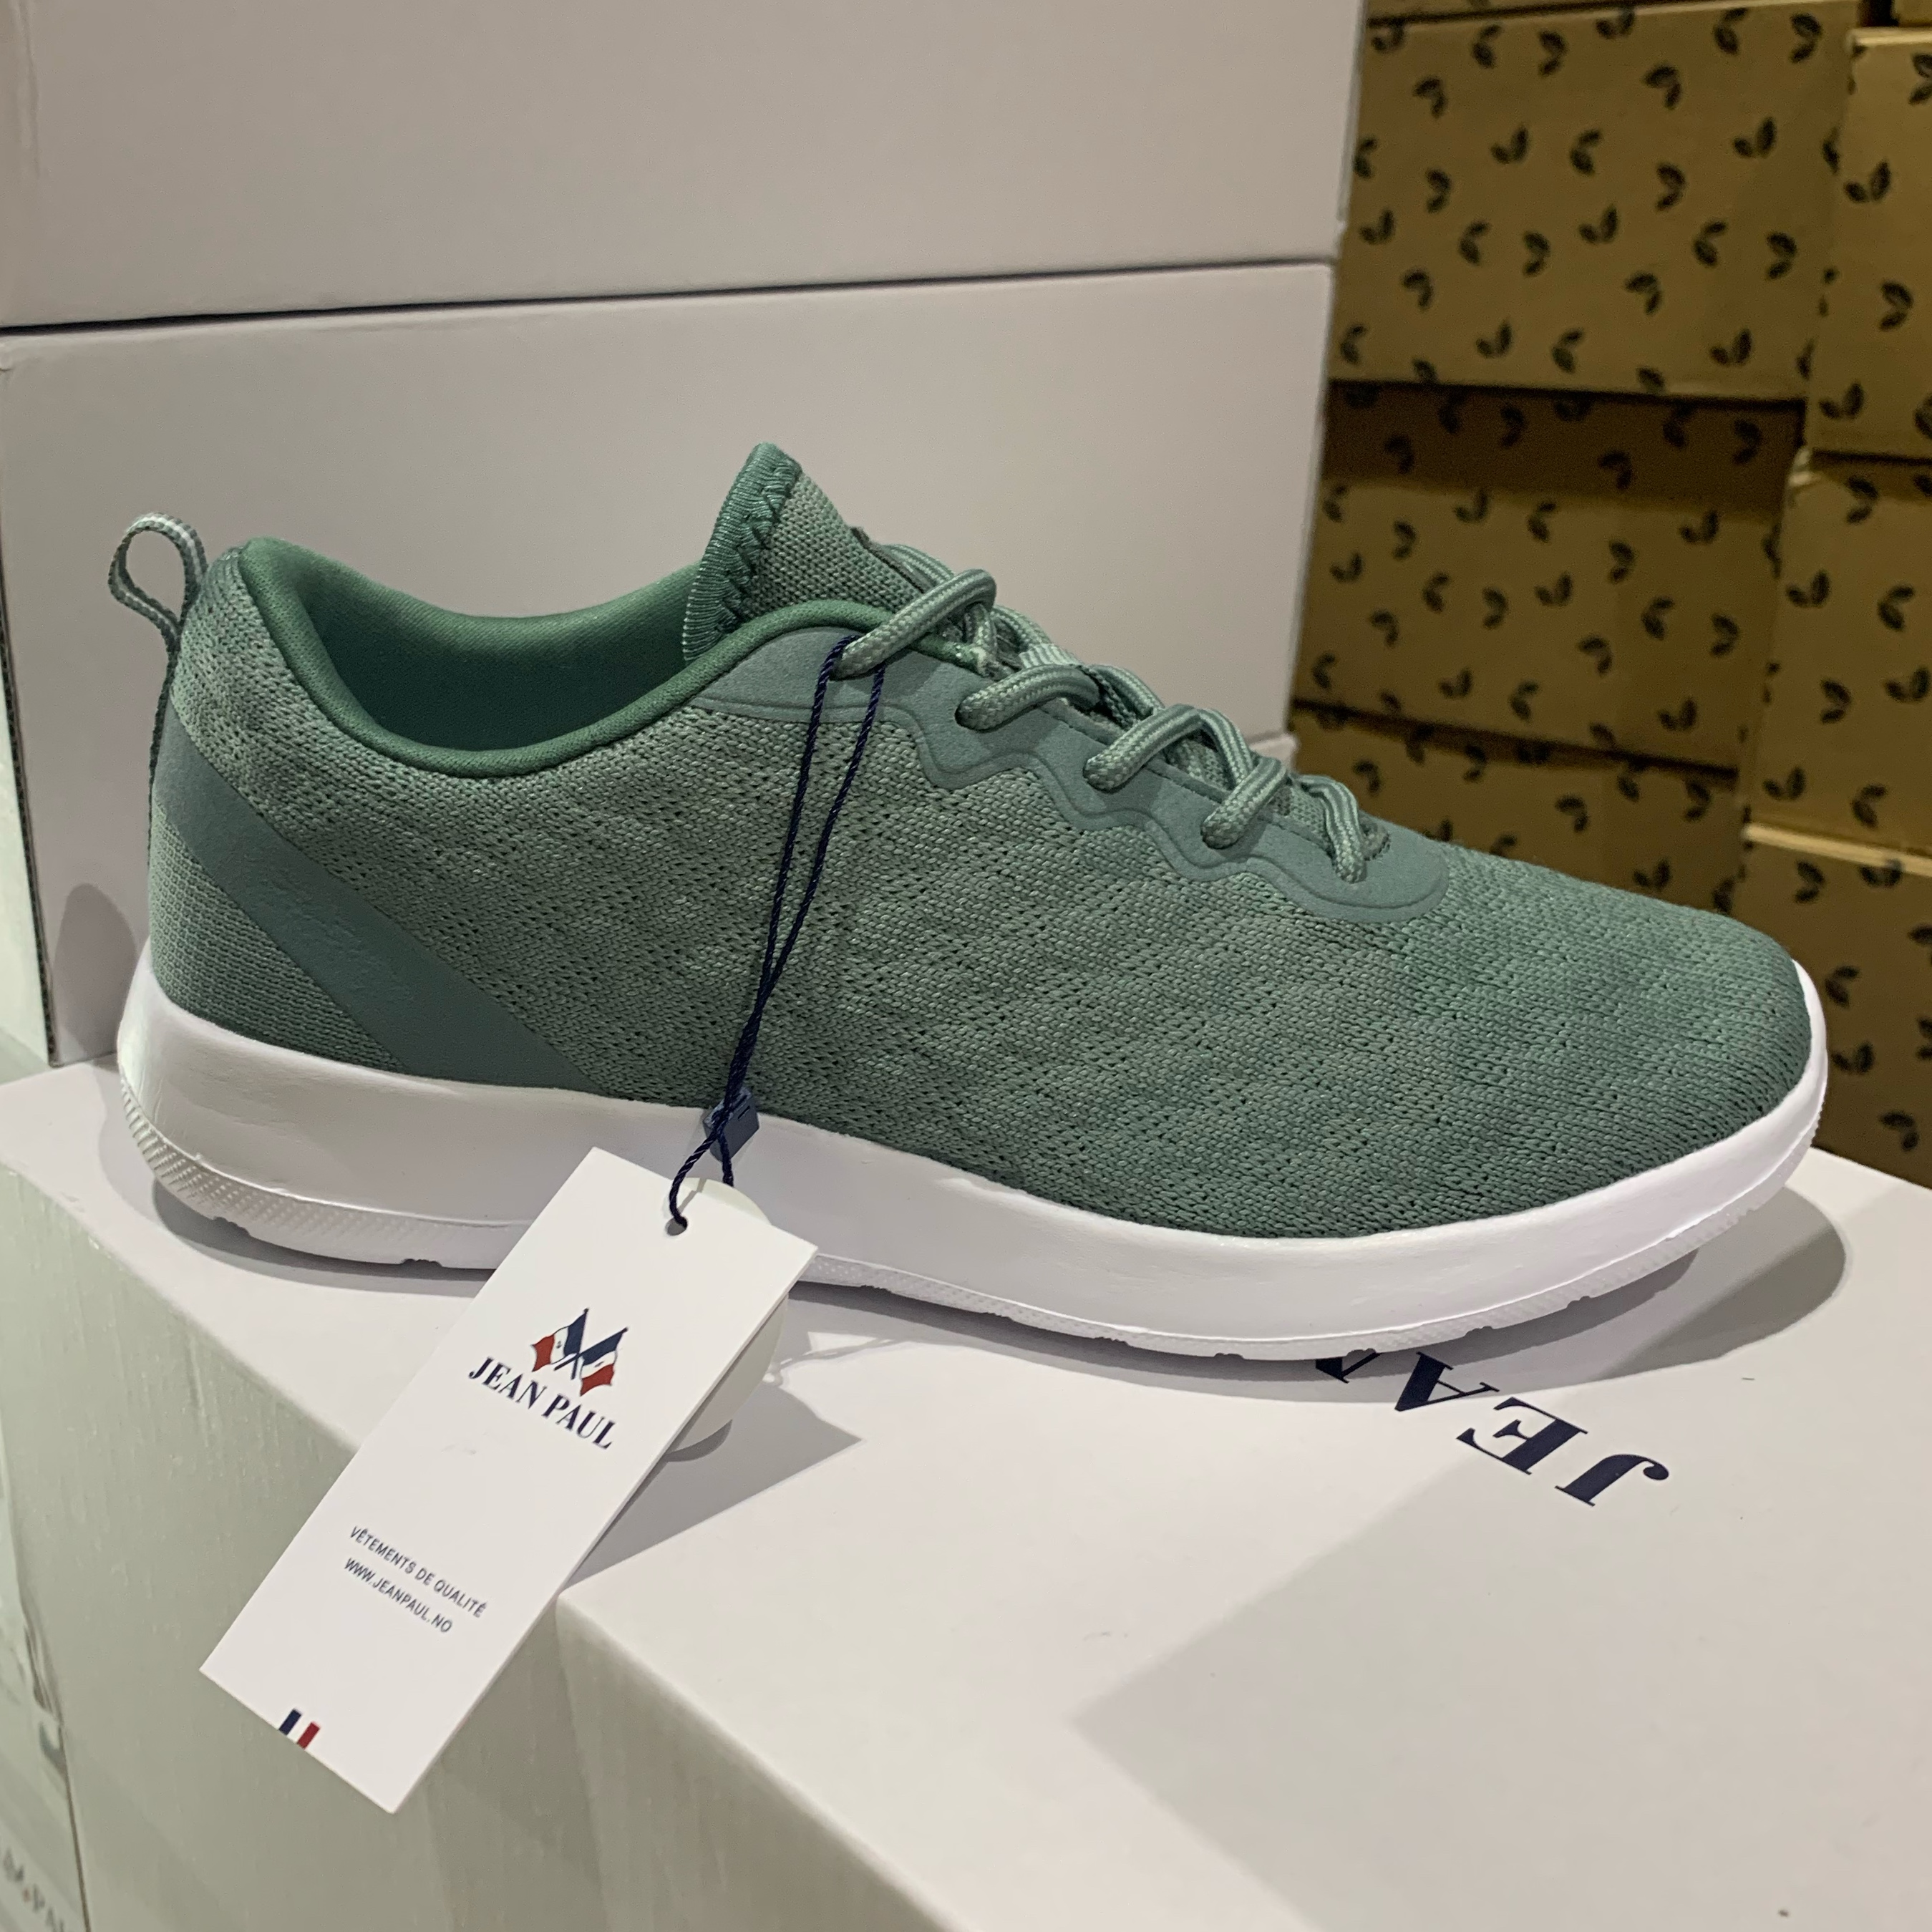 jean paul – fleur ll green sneakers dame sommersko5